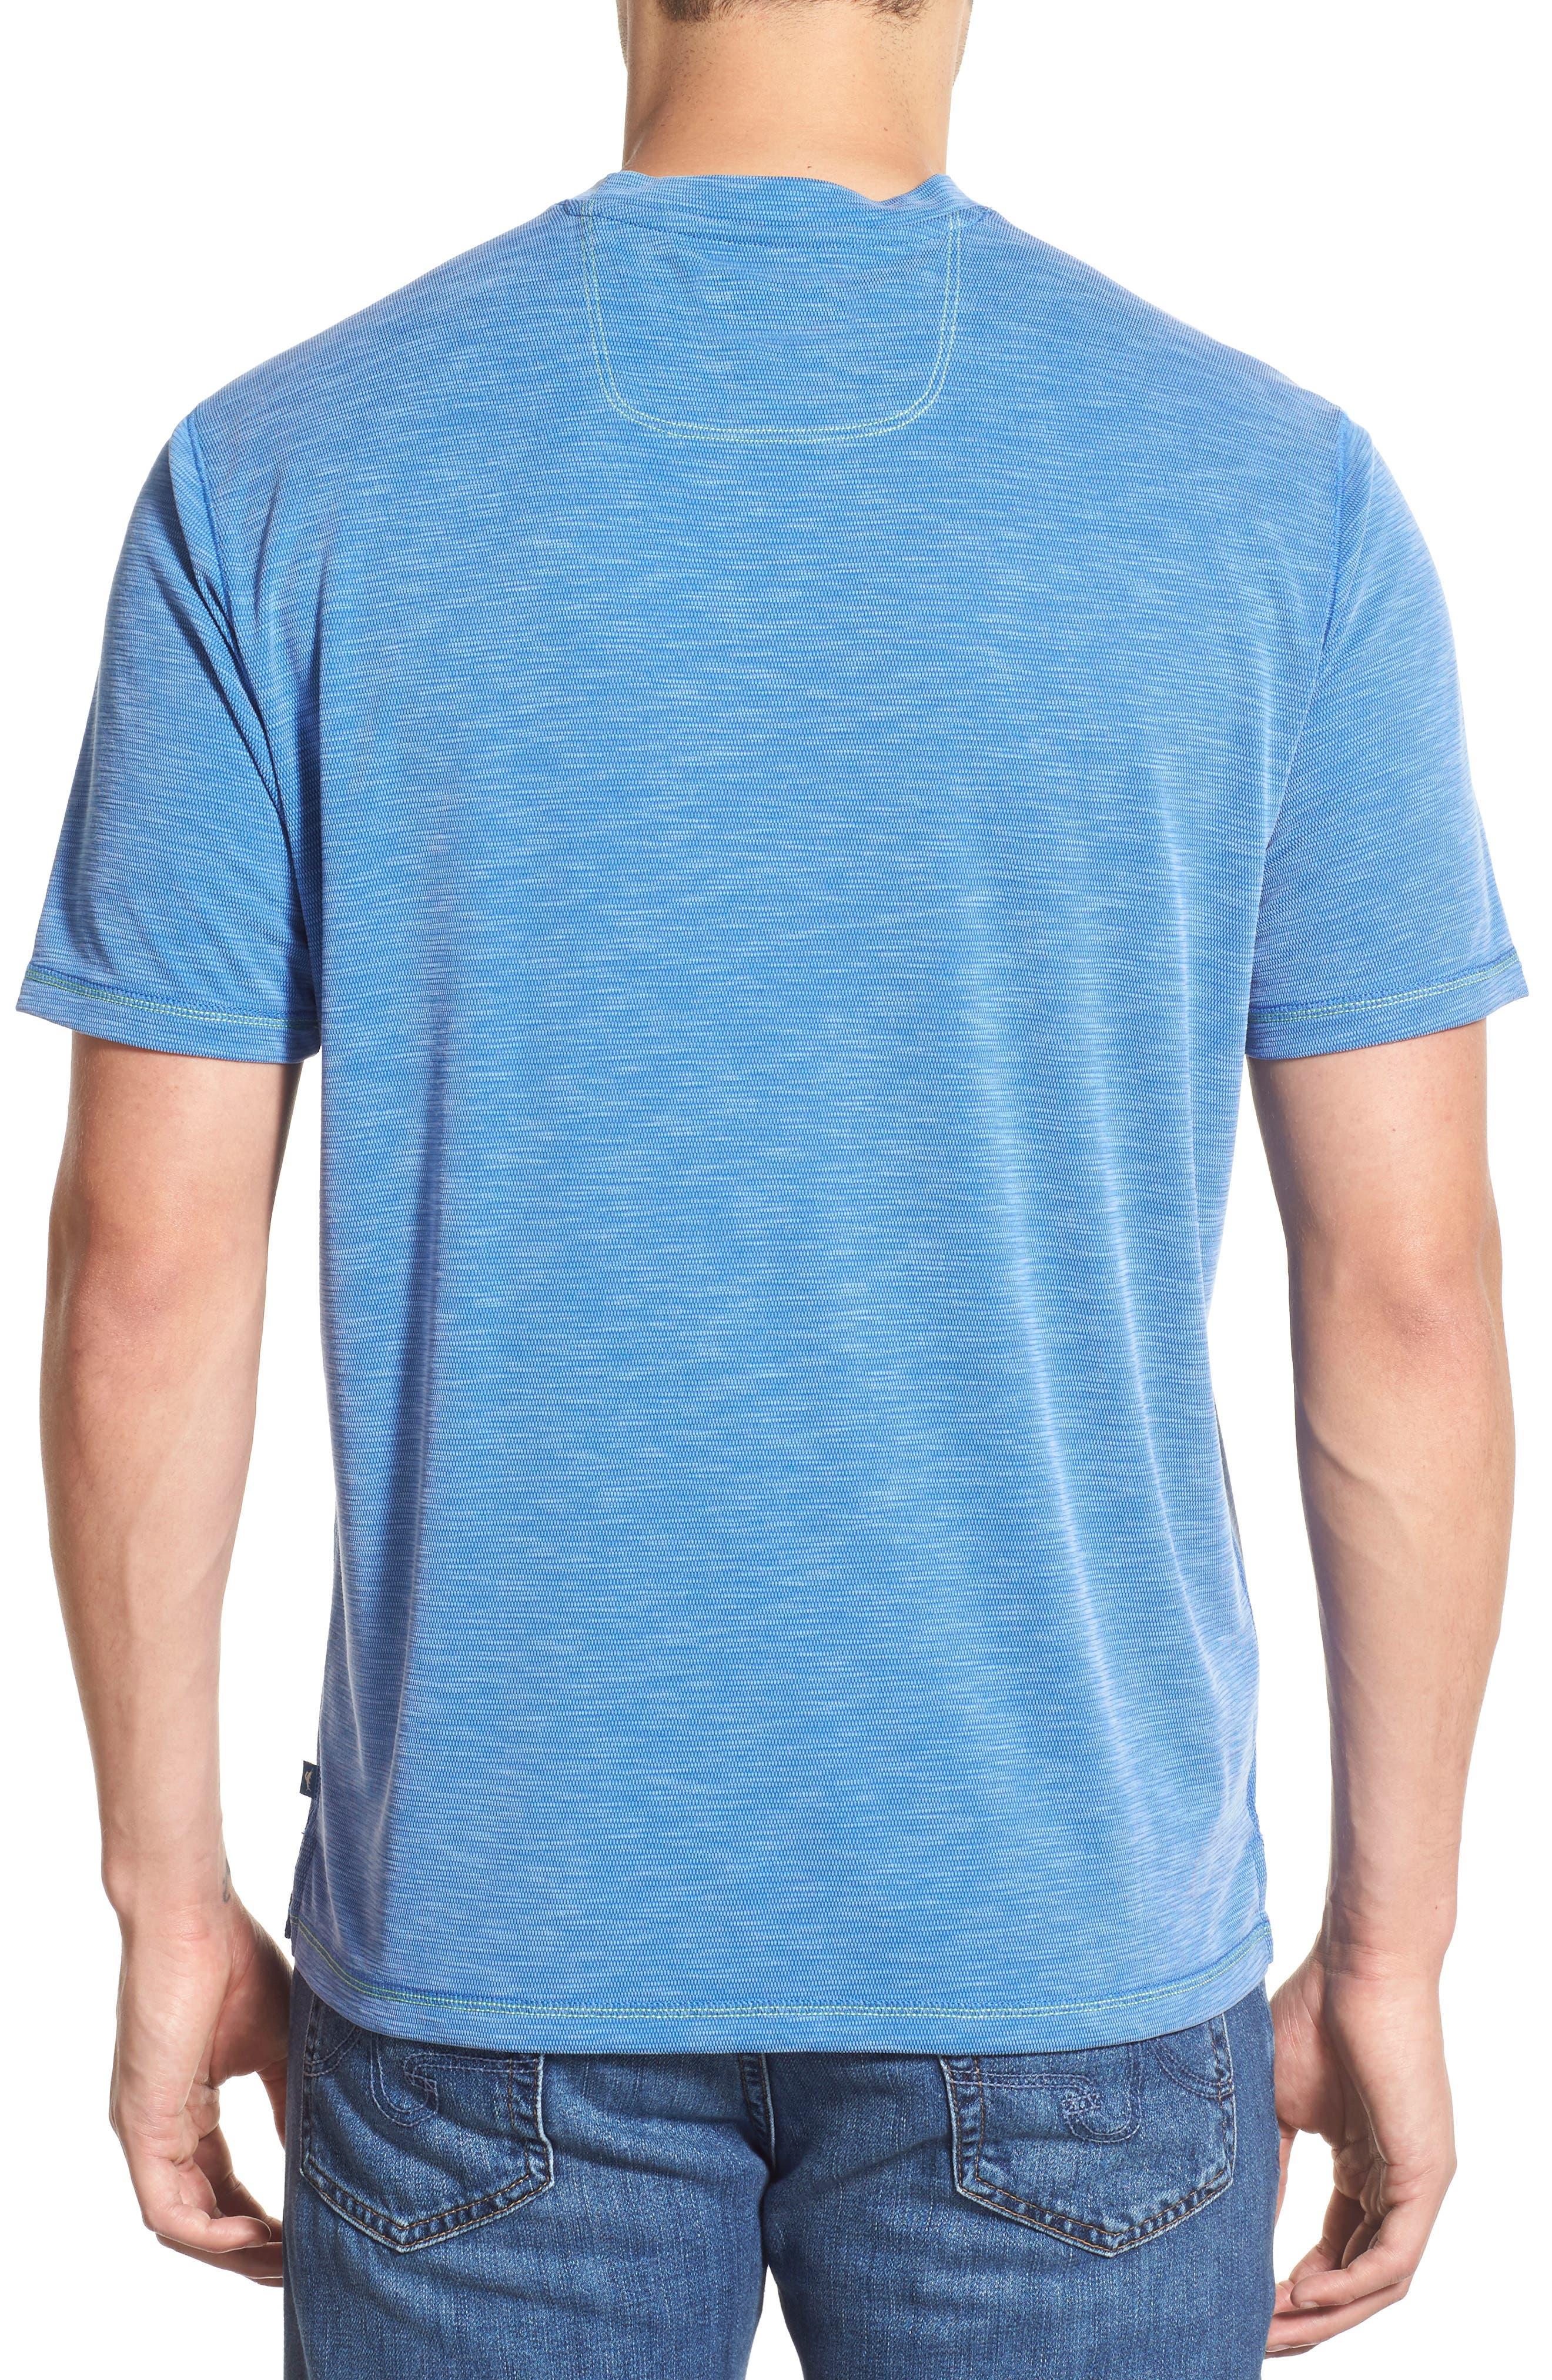 Paradise Around T-Shirt,                             Alternate thumbnail 2, color,                             Bright Cobalt